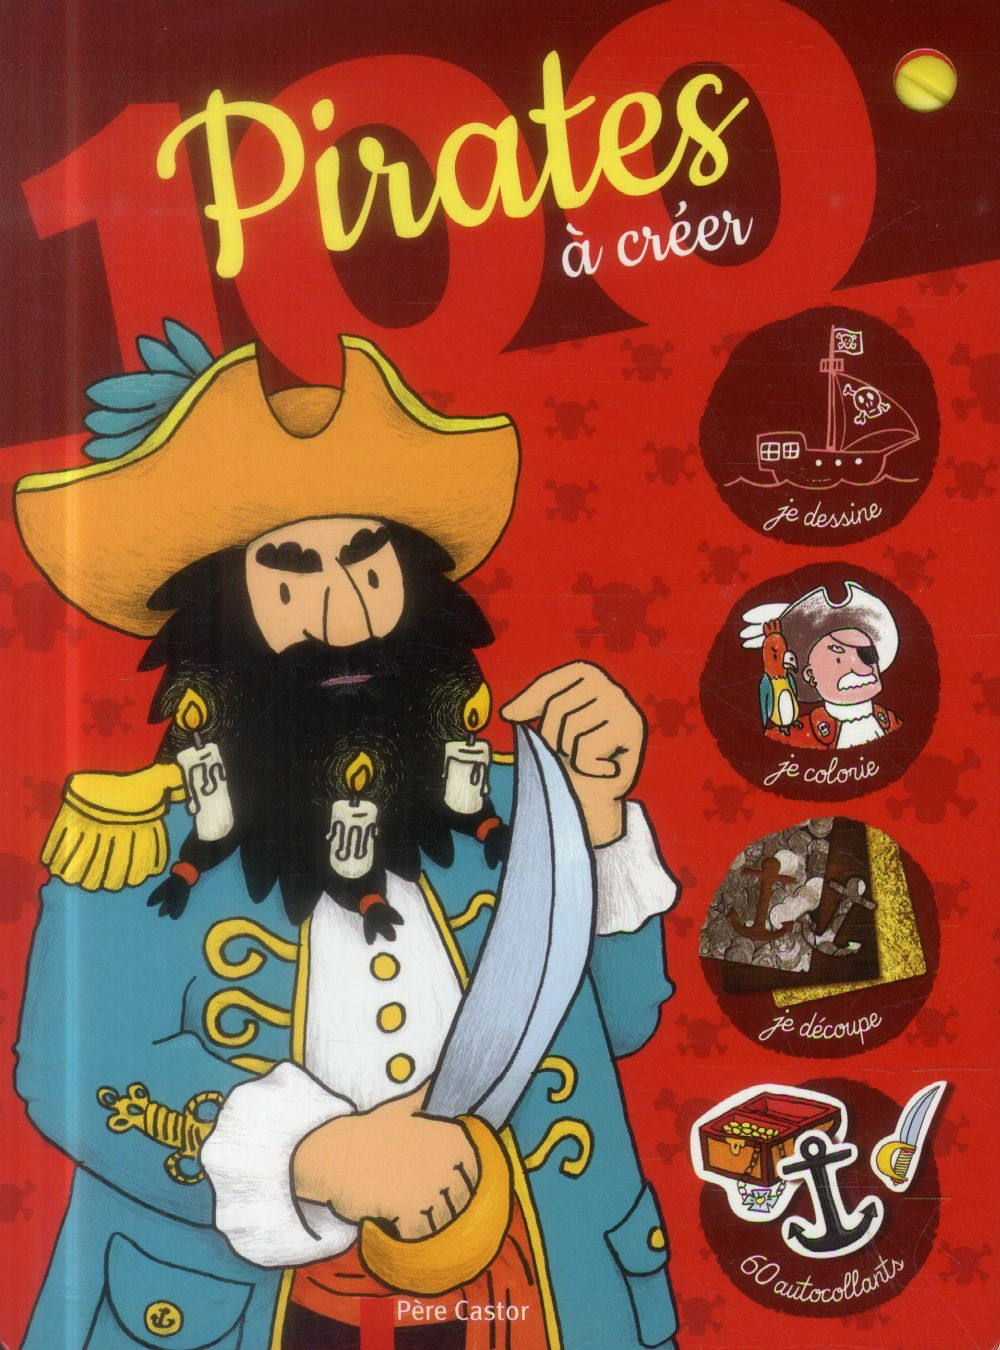 JE DESSINE COMME UN GRAND ; 100 pirates à creer